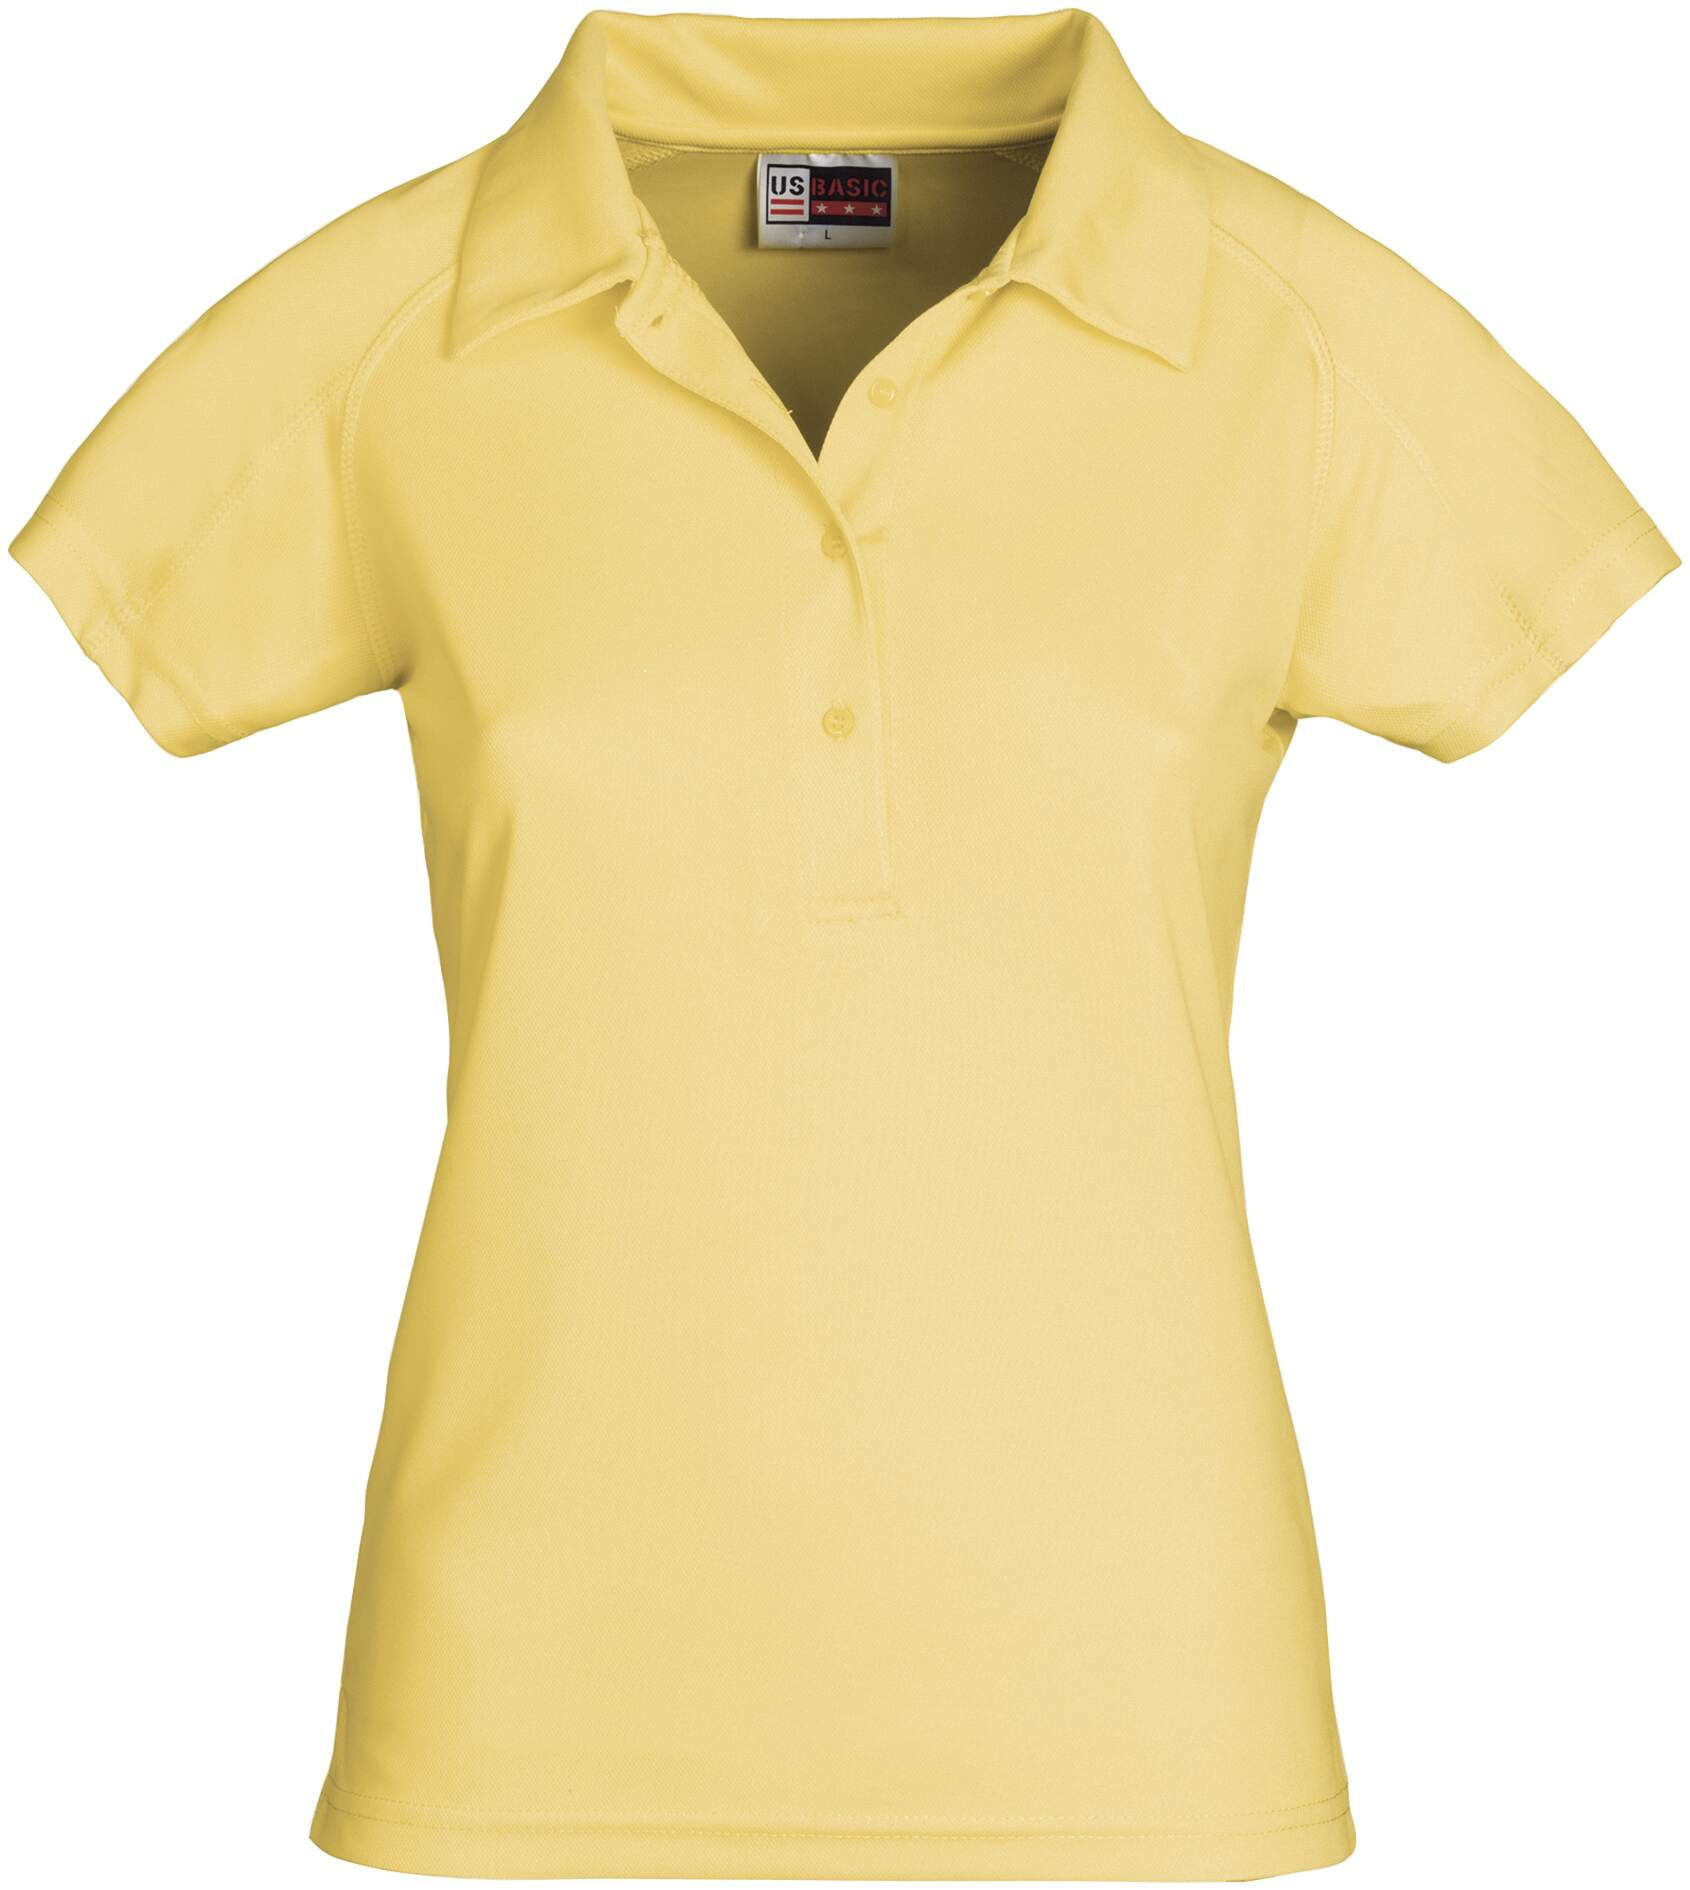 Koszulki Polo US 31097 Cool Fit - 31097_żółty_US - Kolor: Żółty